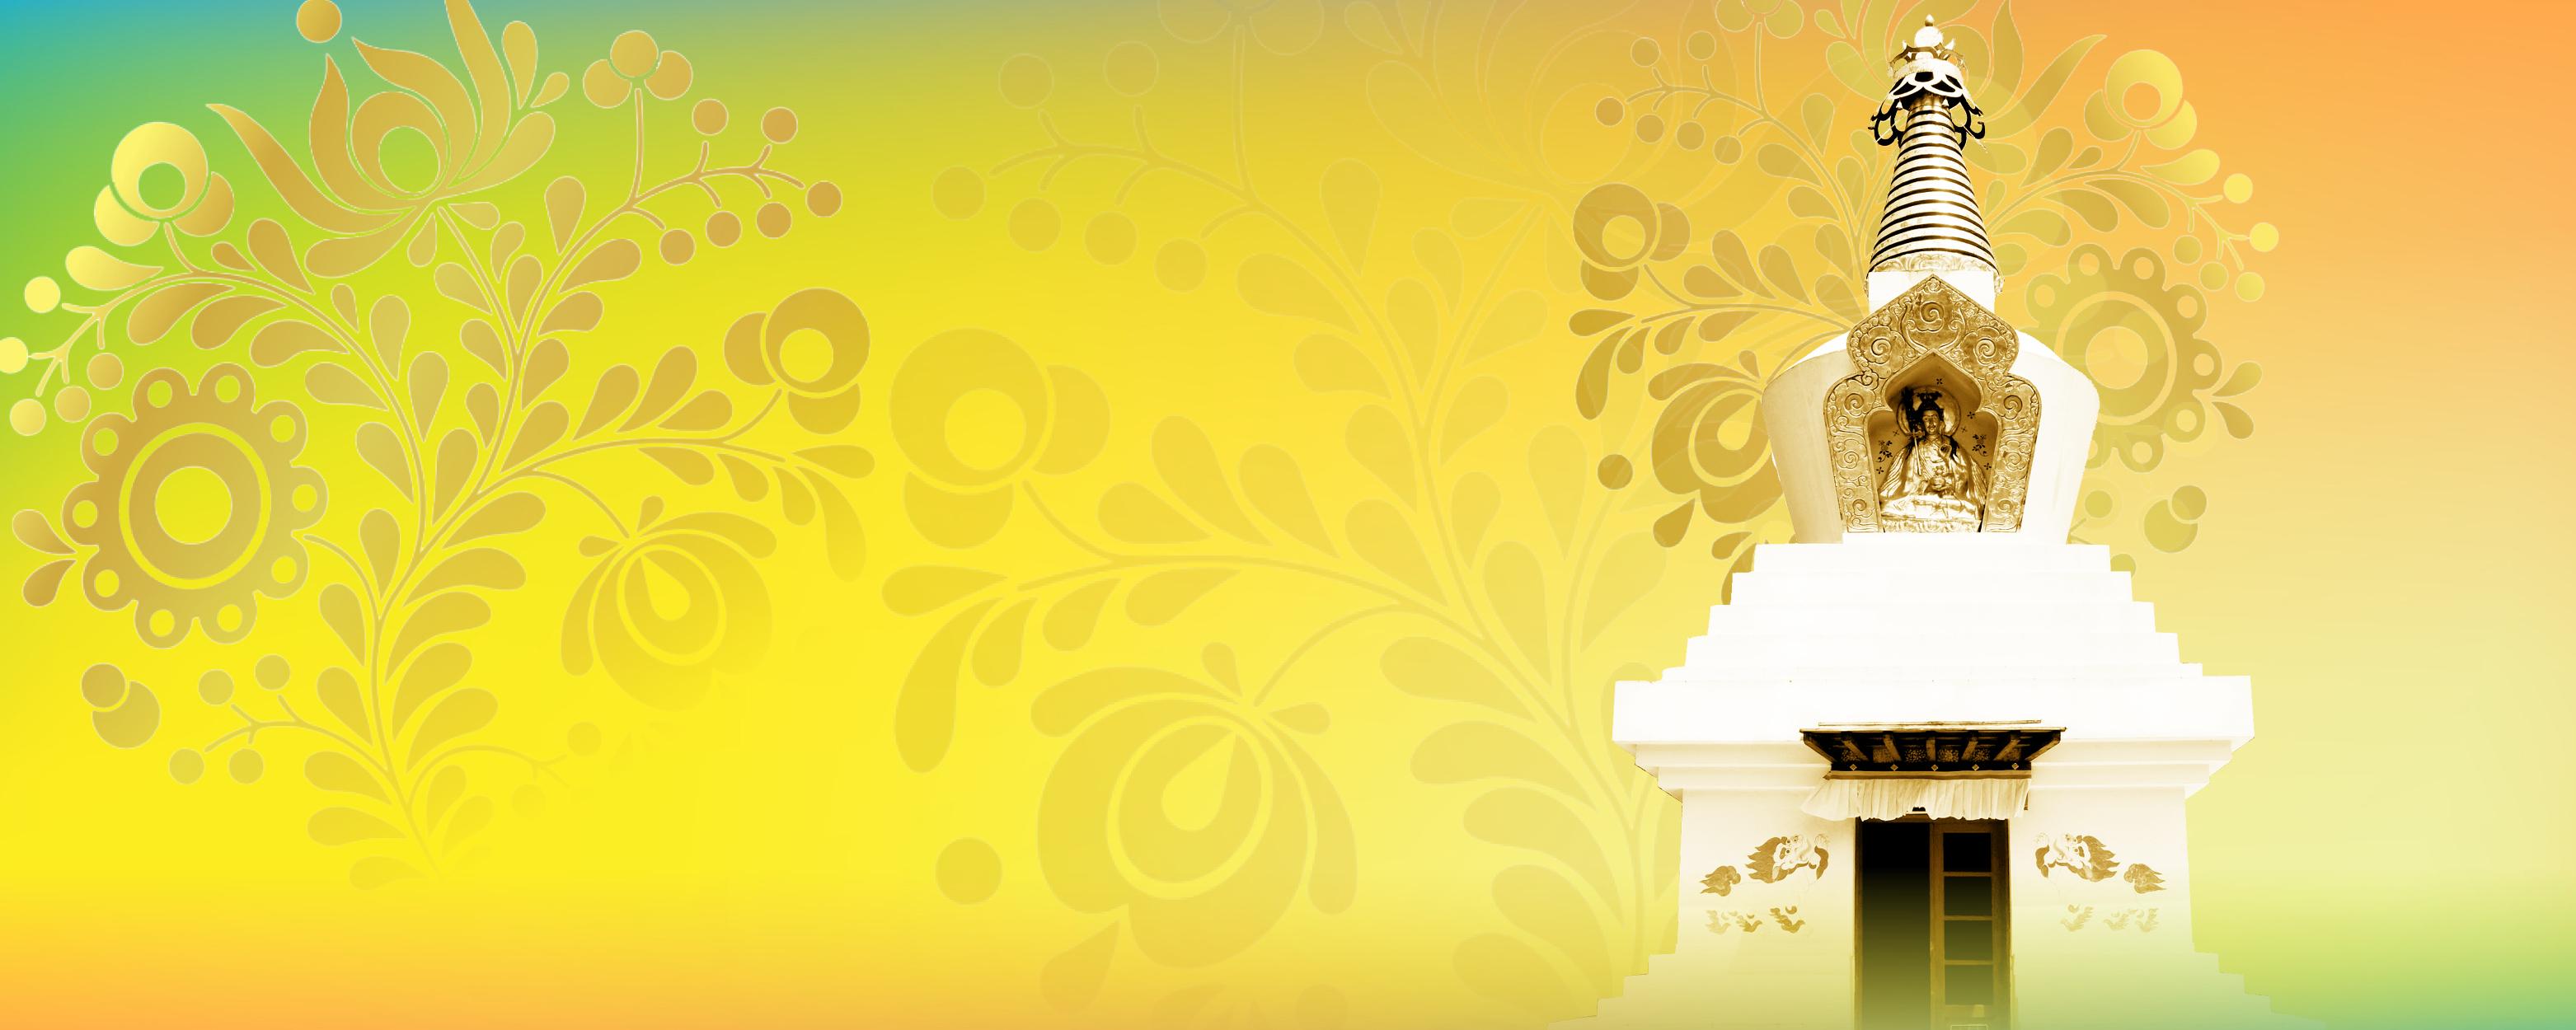 Húsvéti Ünnepség Taron @ Tara Templom - Tar